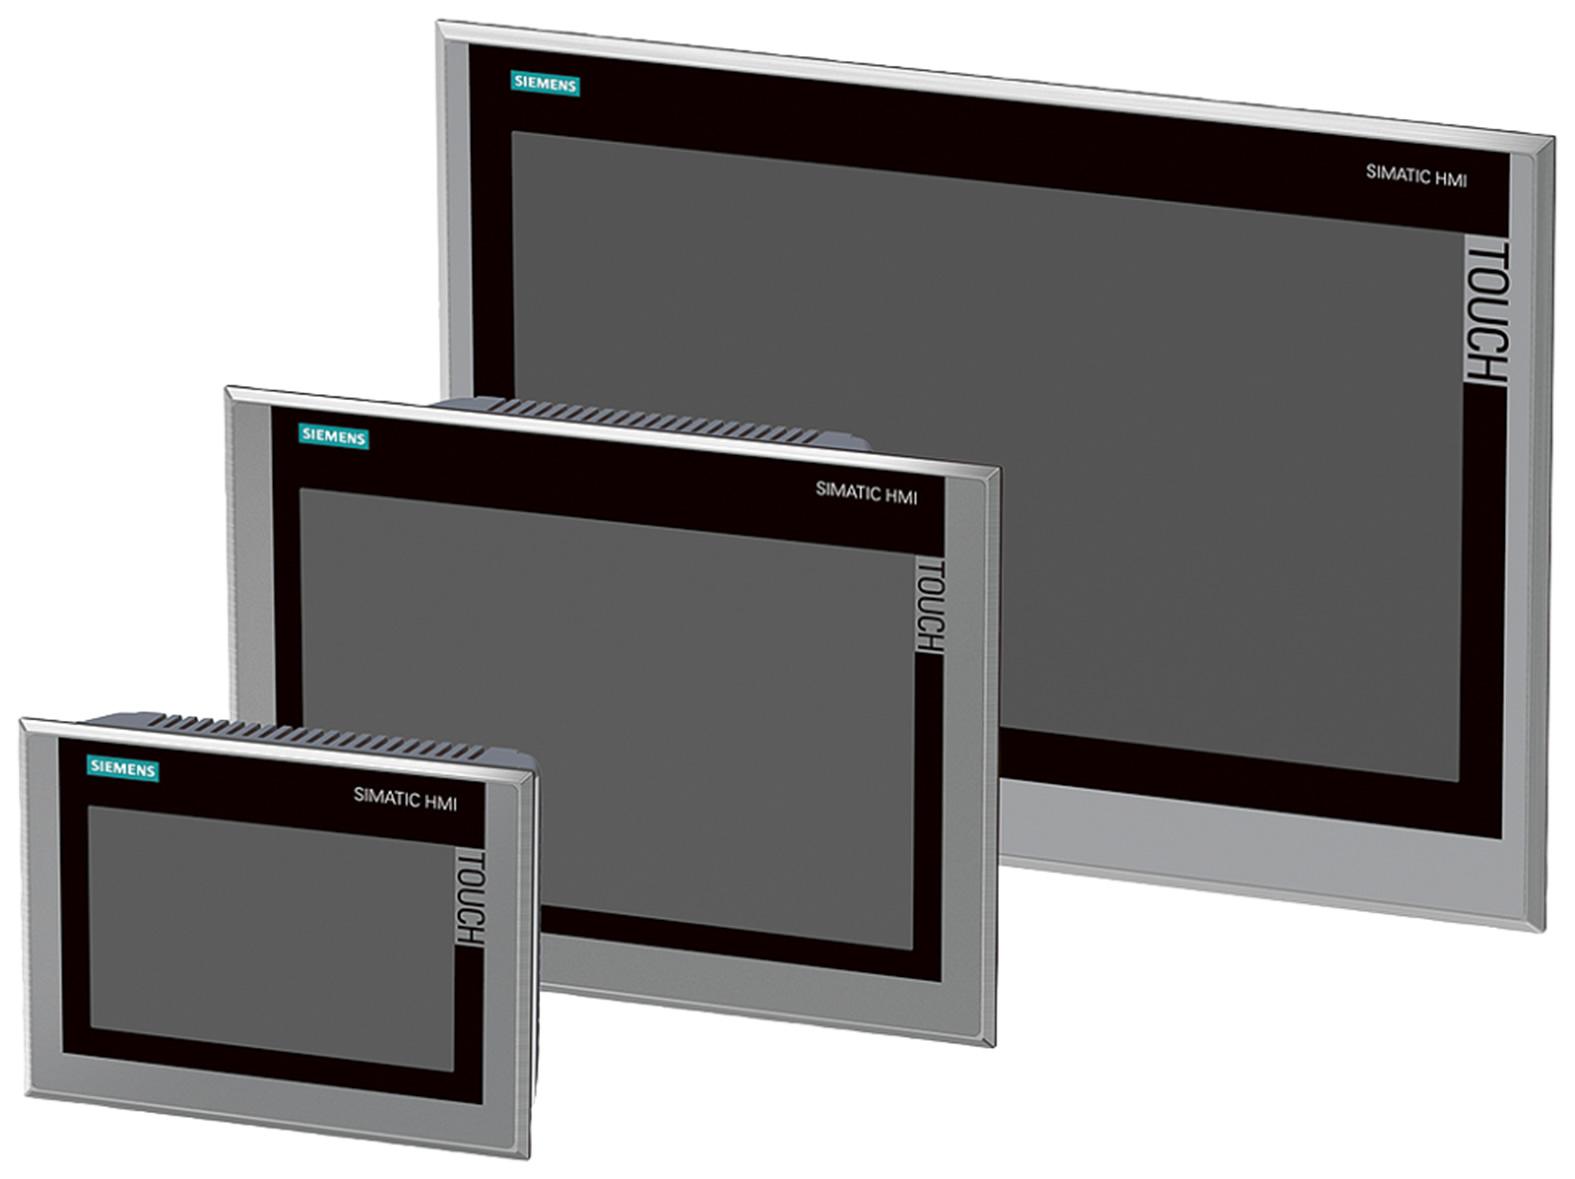 Siemens Energy Monitoring Systems : Simatic hmi comfort panels triflex